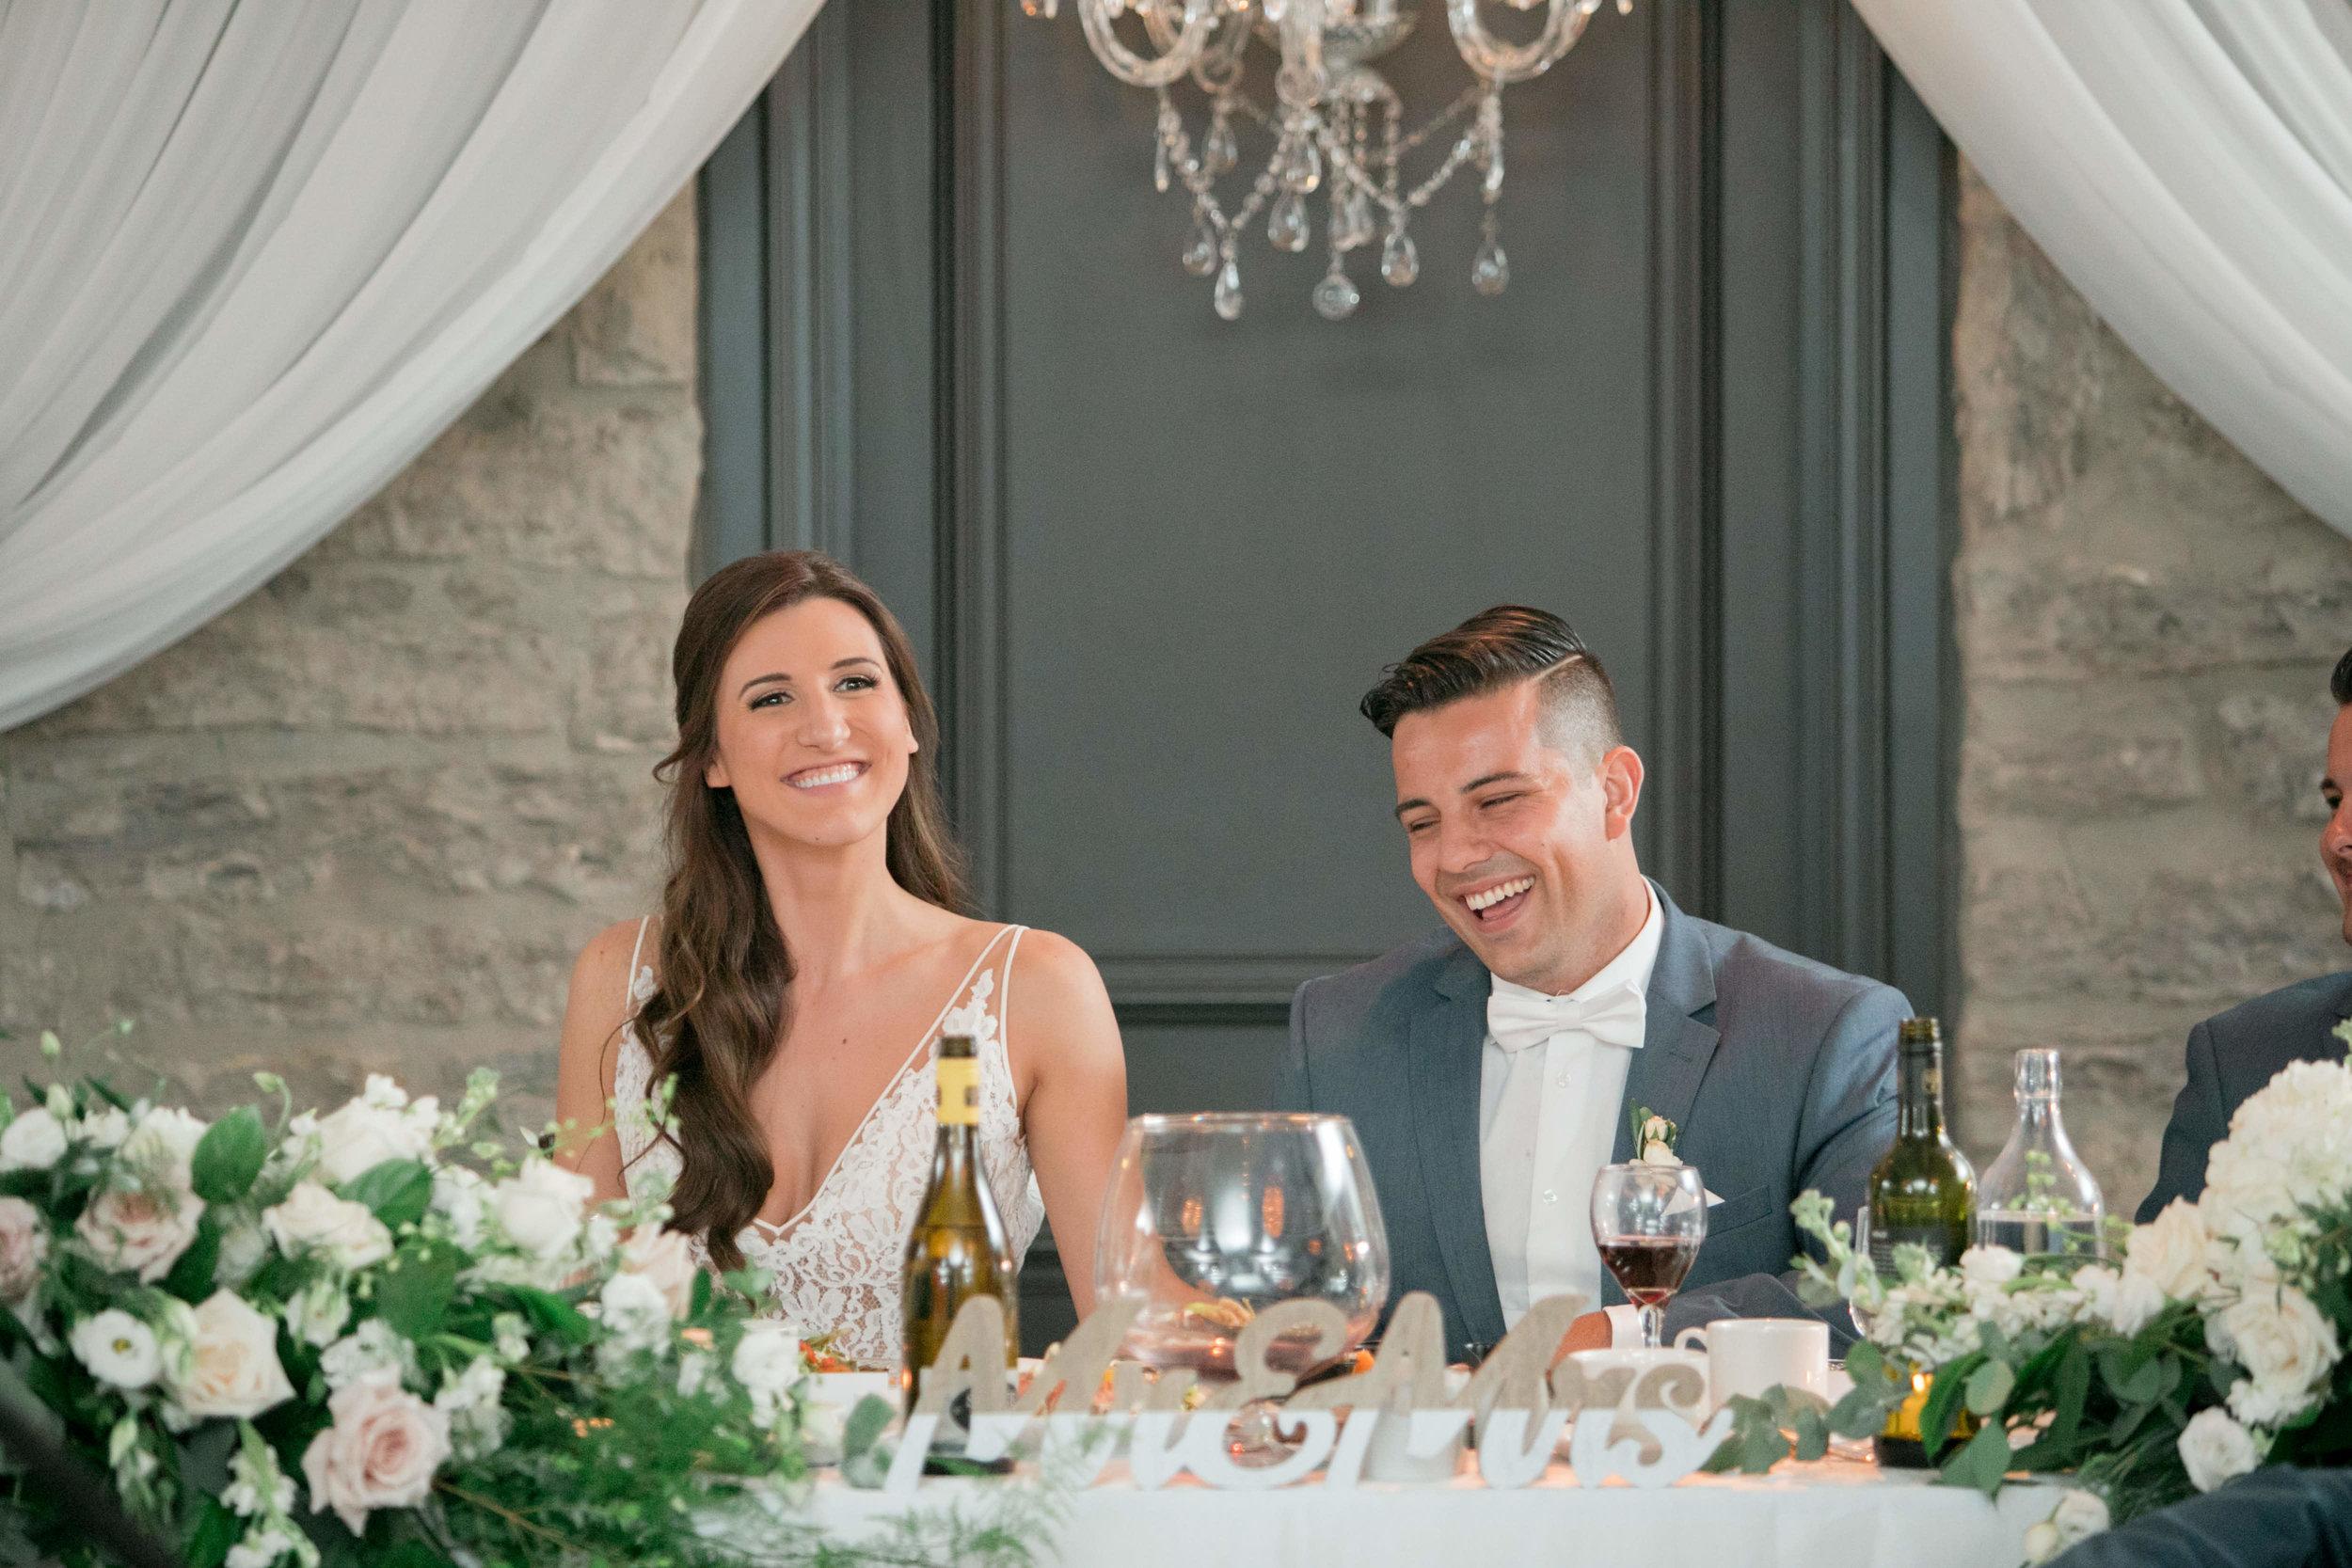 Miranda___Daniel___Daniel_Ricci_Weddings___High_Res._Finals_586.jpg